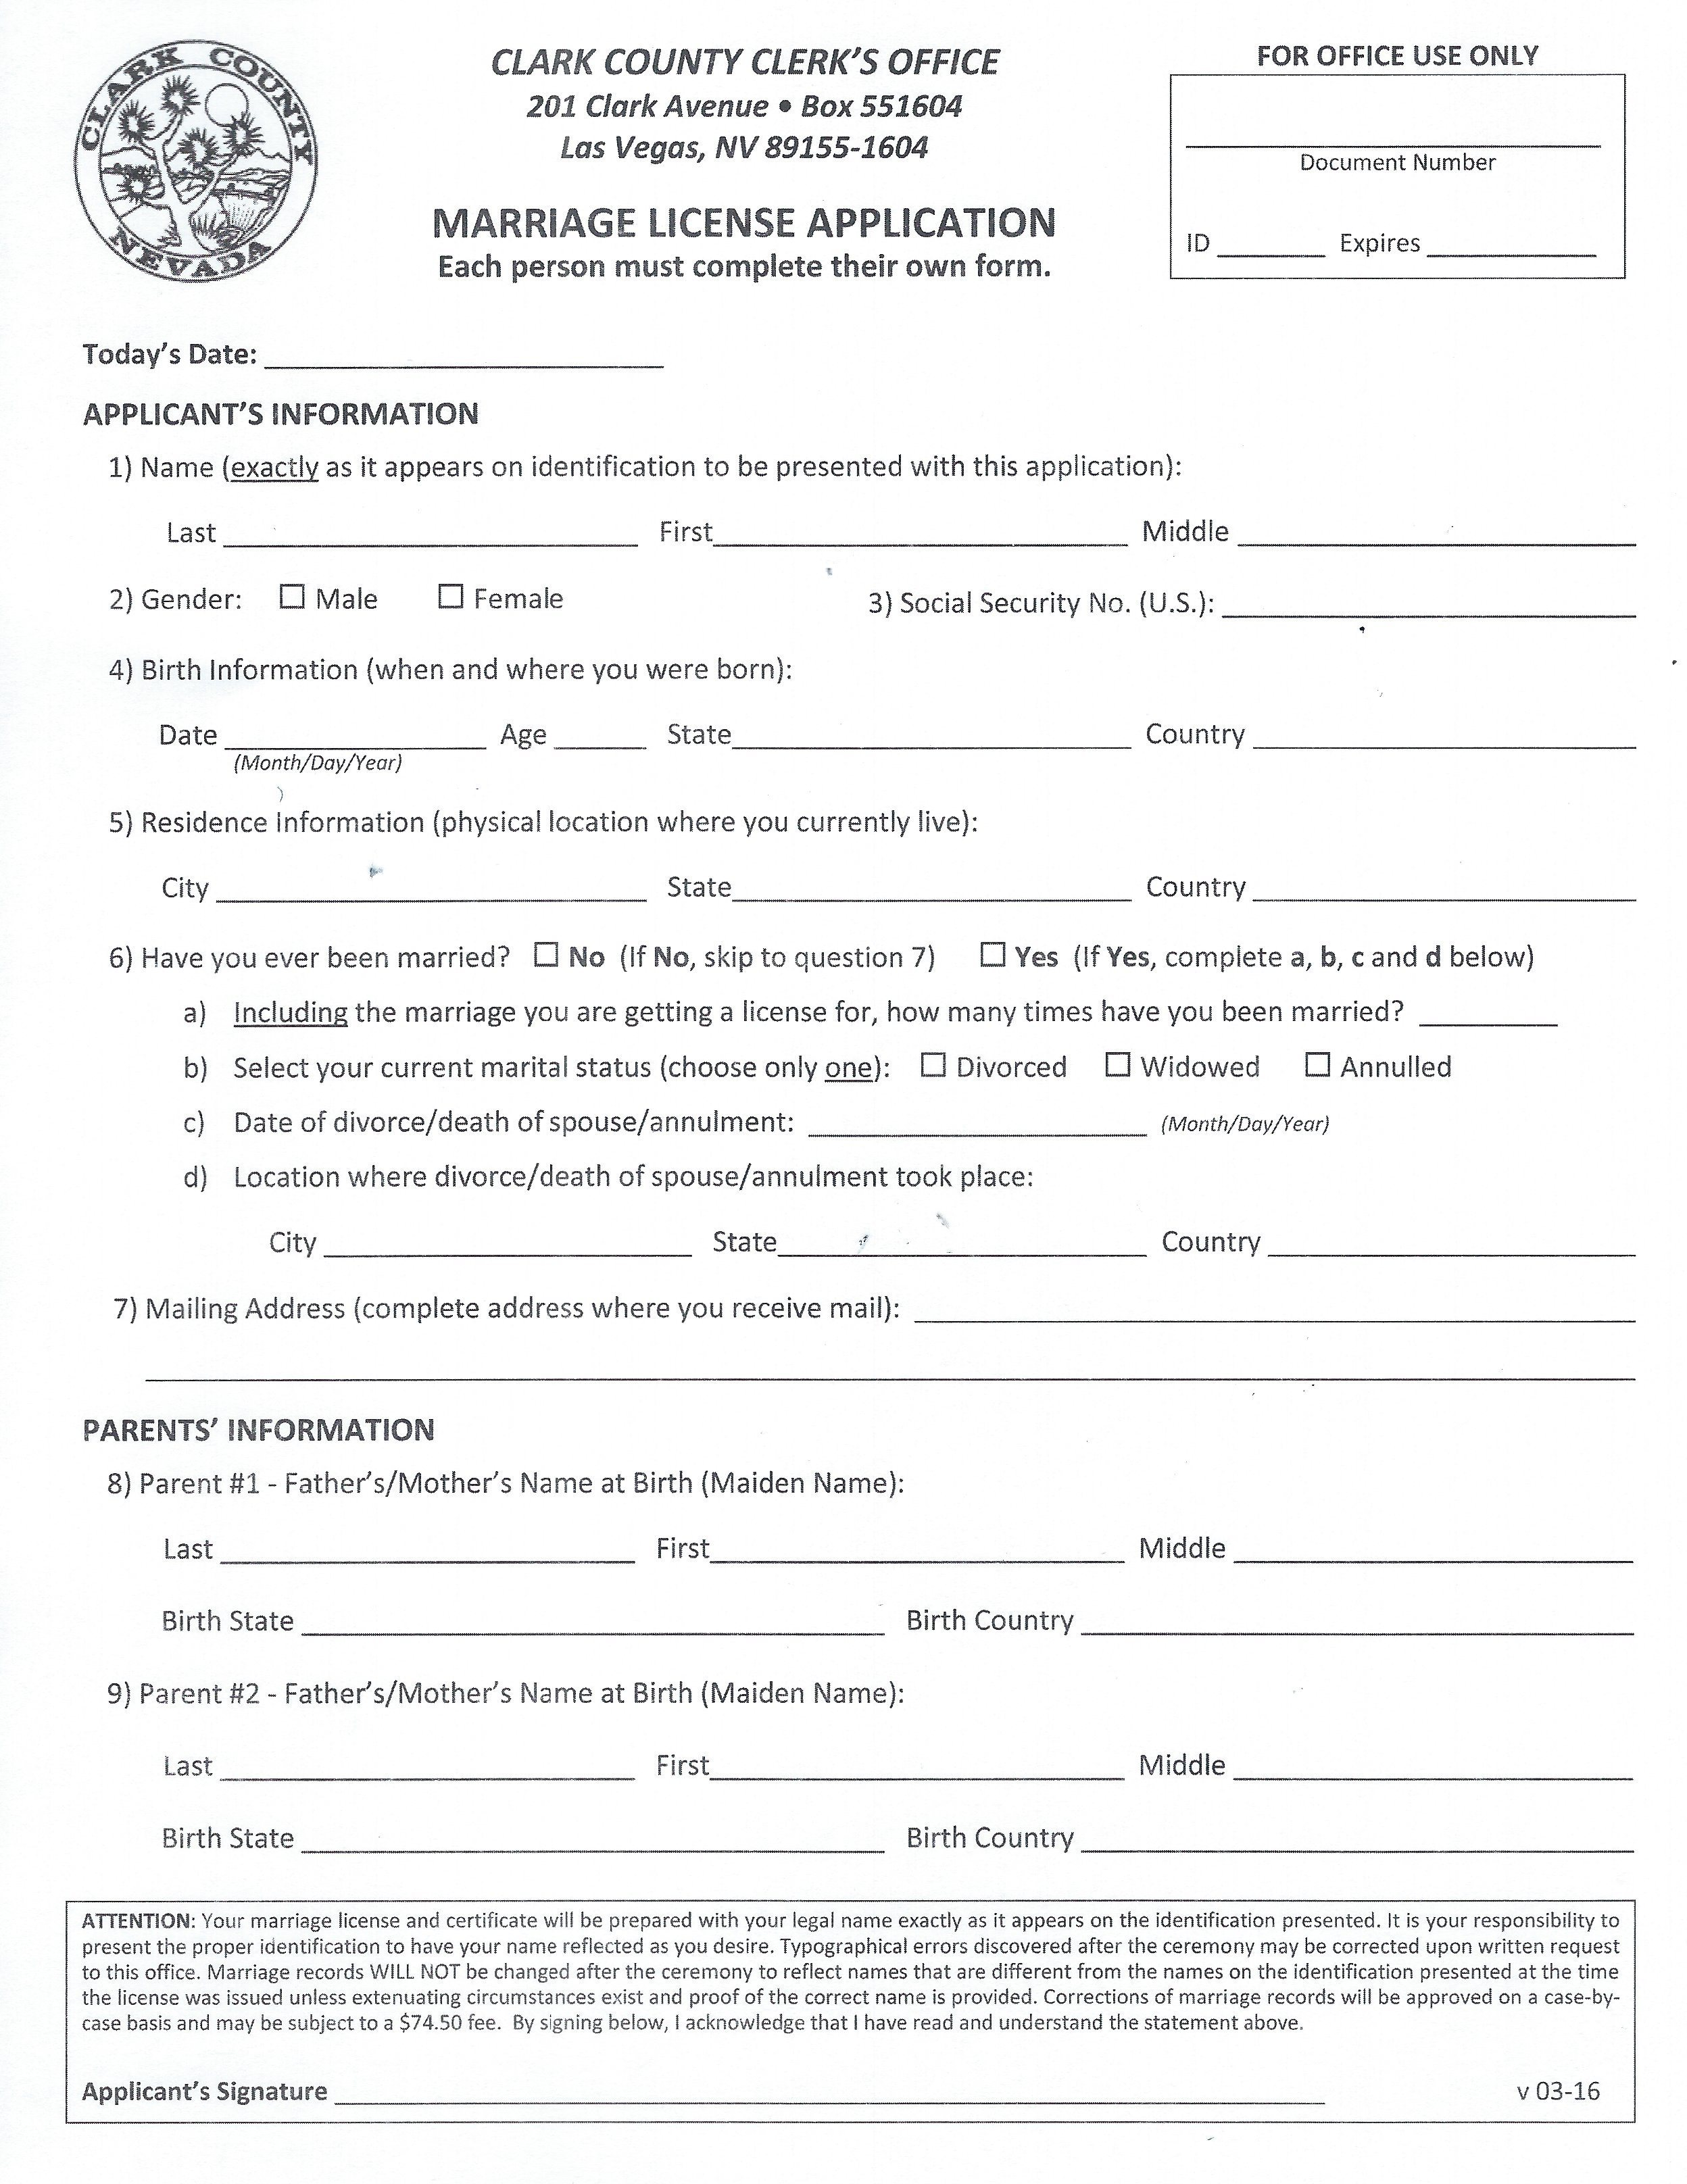 Marriage License Application Little Vegas Chapel The Little Vegas